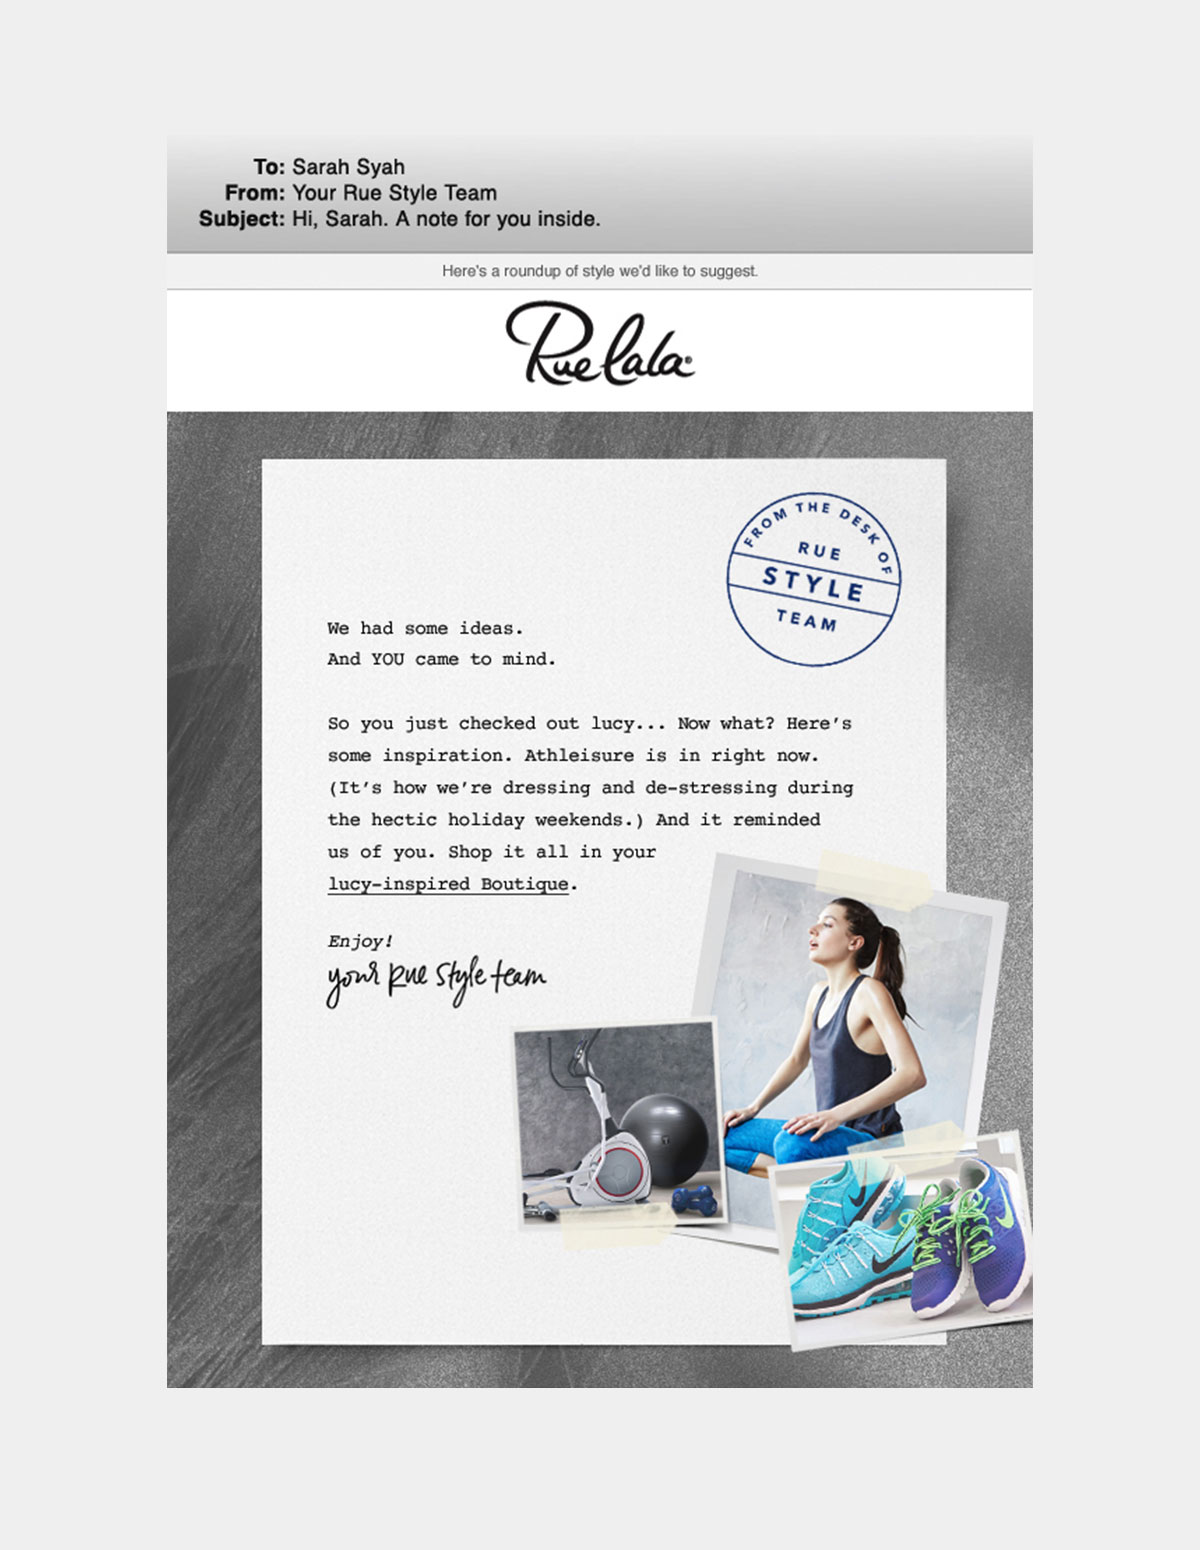 Laura-vanessa-gonzalez-lvg-lvgdesign-lvgworks-art-direction-director-artist-graphic-design-designer-photography-photographer-fashion-editorial-tabletop-set-boston-freelance-type-typeography-email-marketing-1.jpg